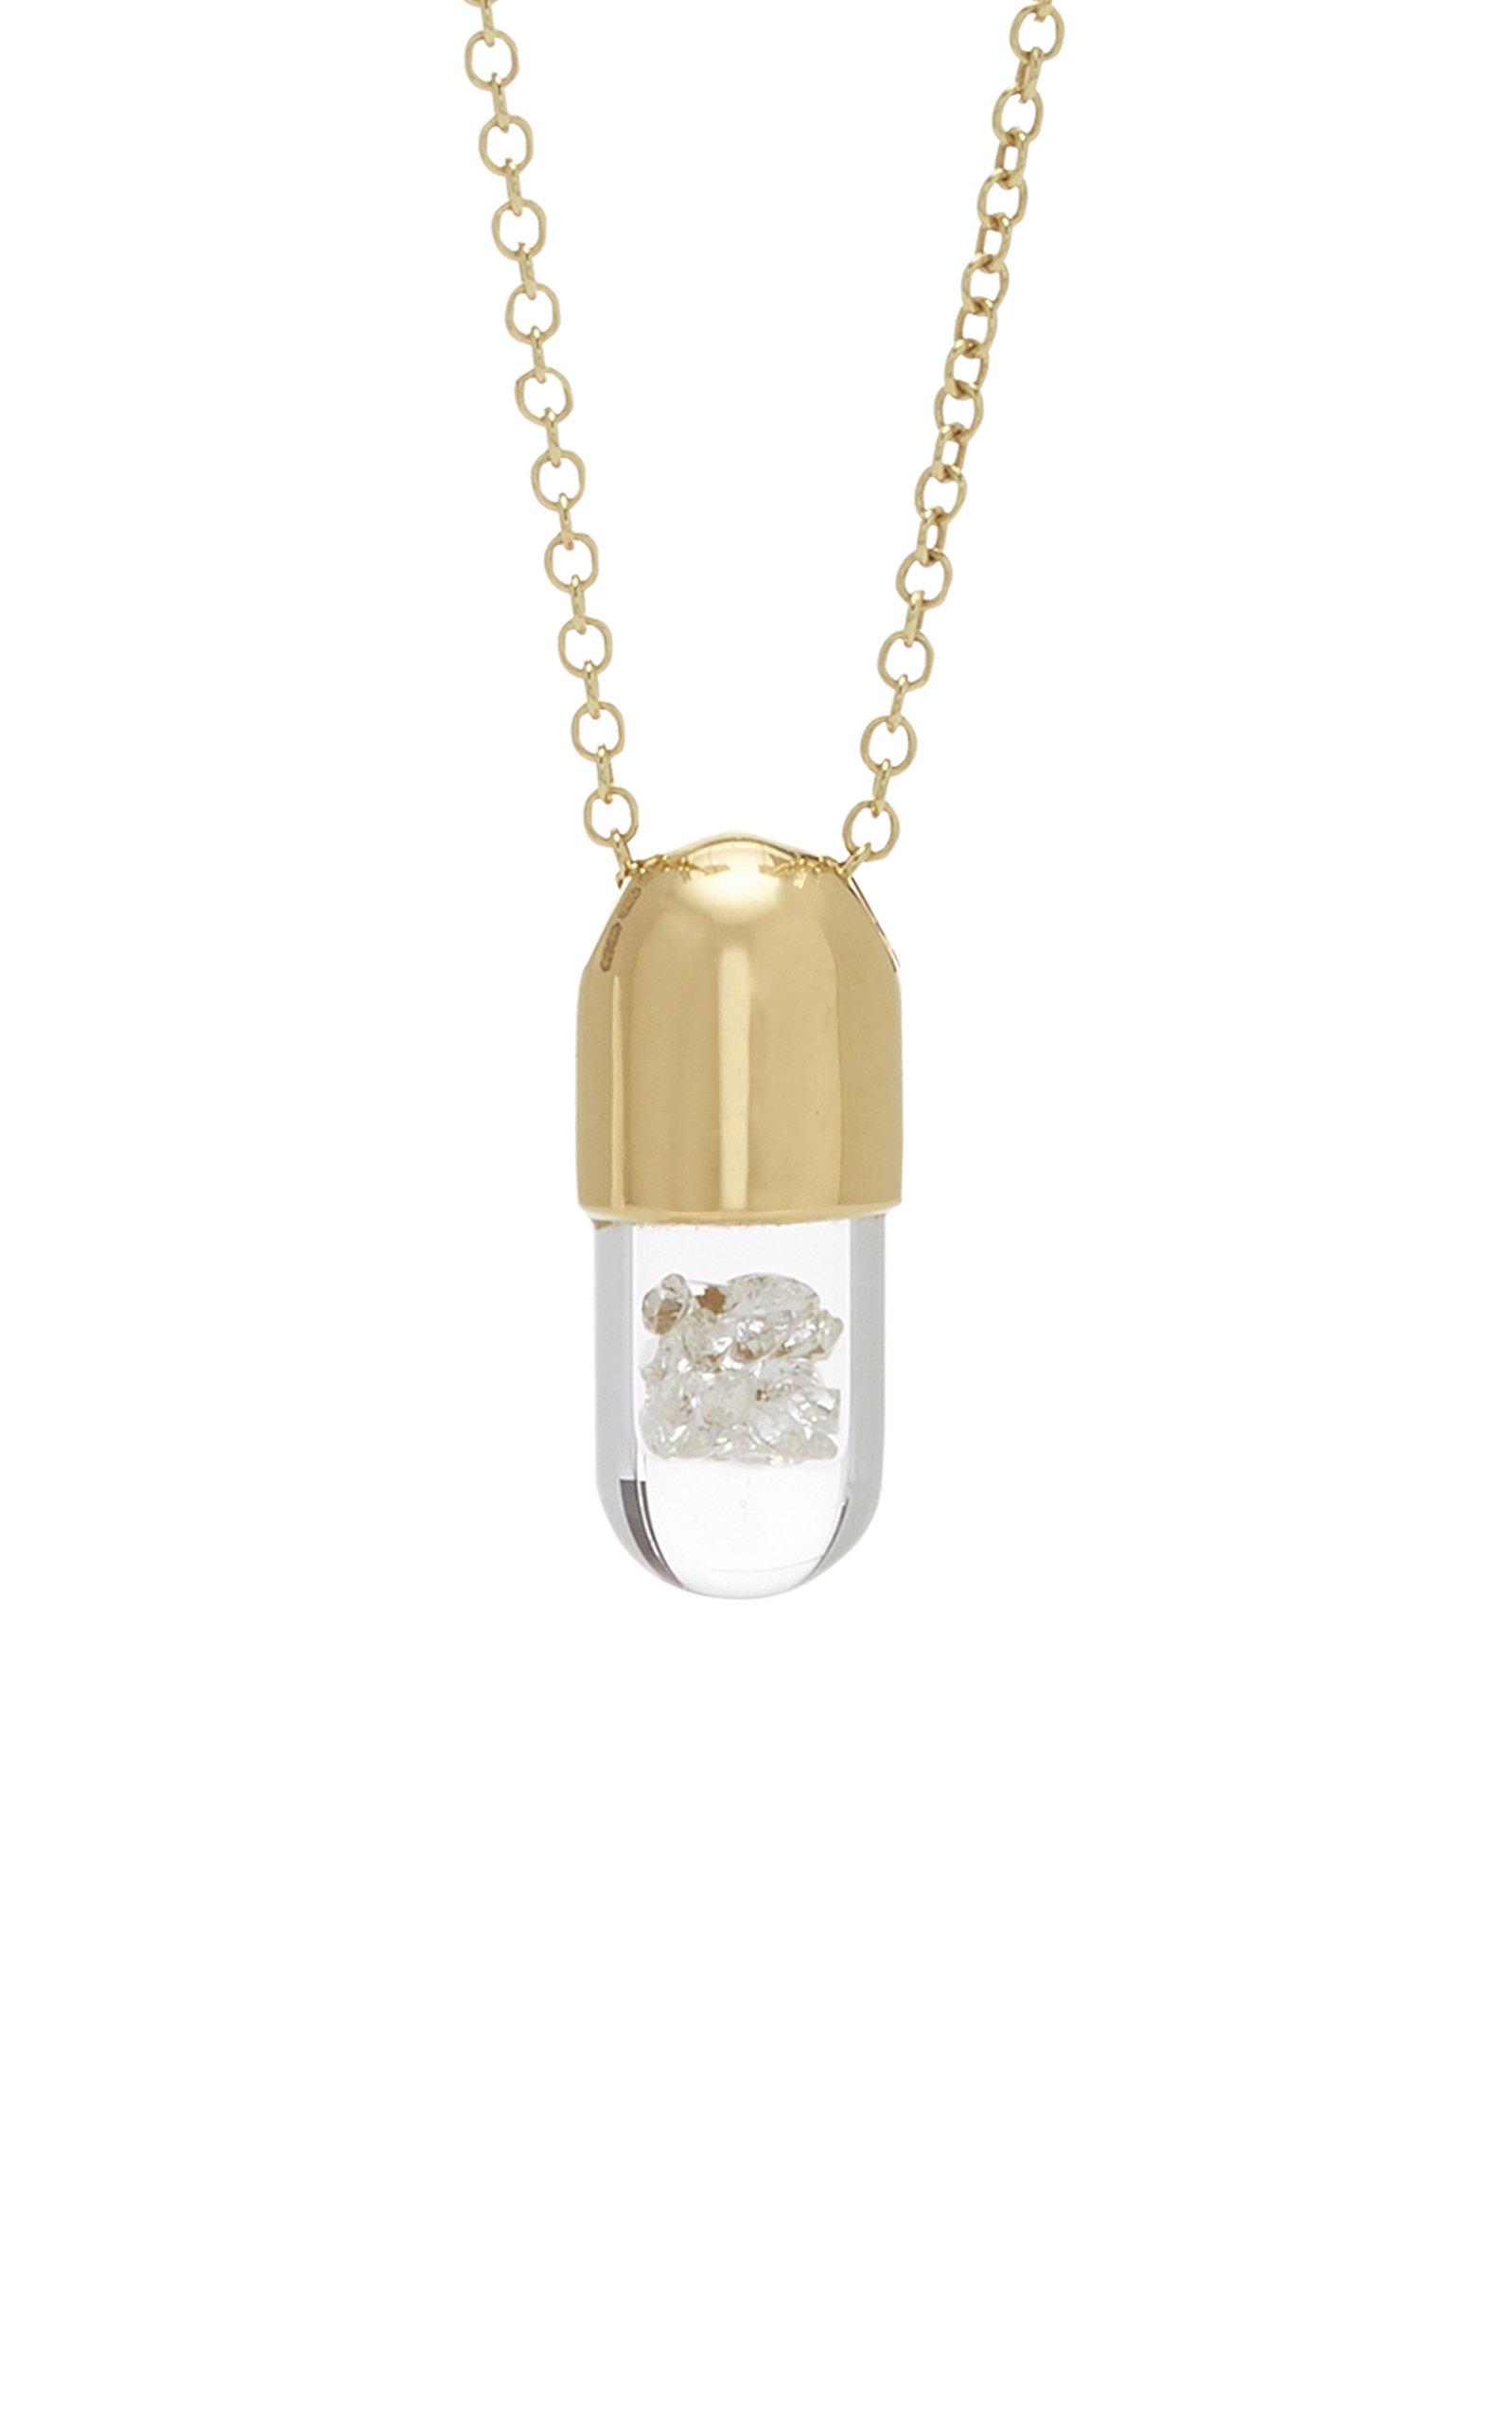 9 K Mini Diamond 'elixir Of Strength' Pendant And Chain by Robinson Pelham